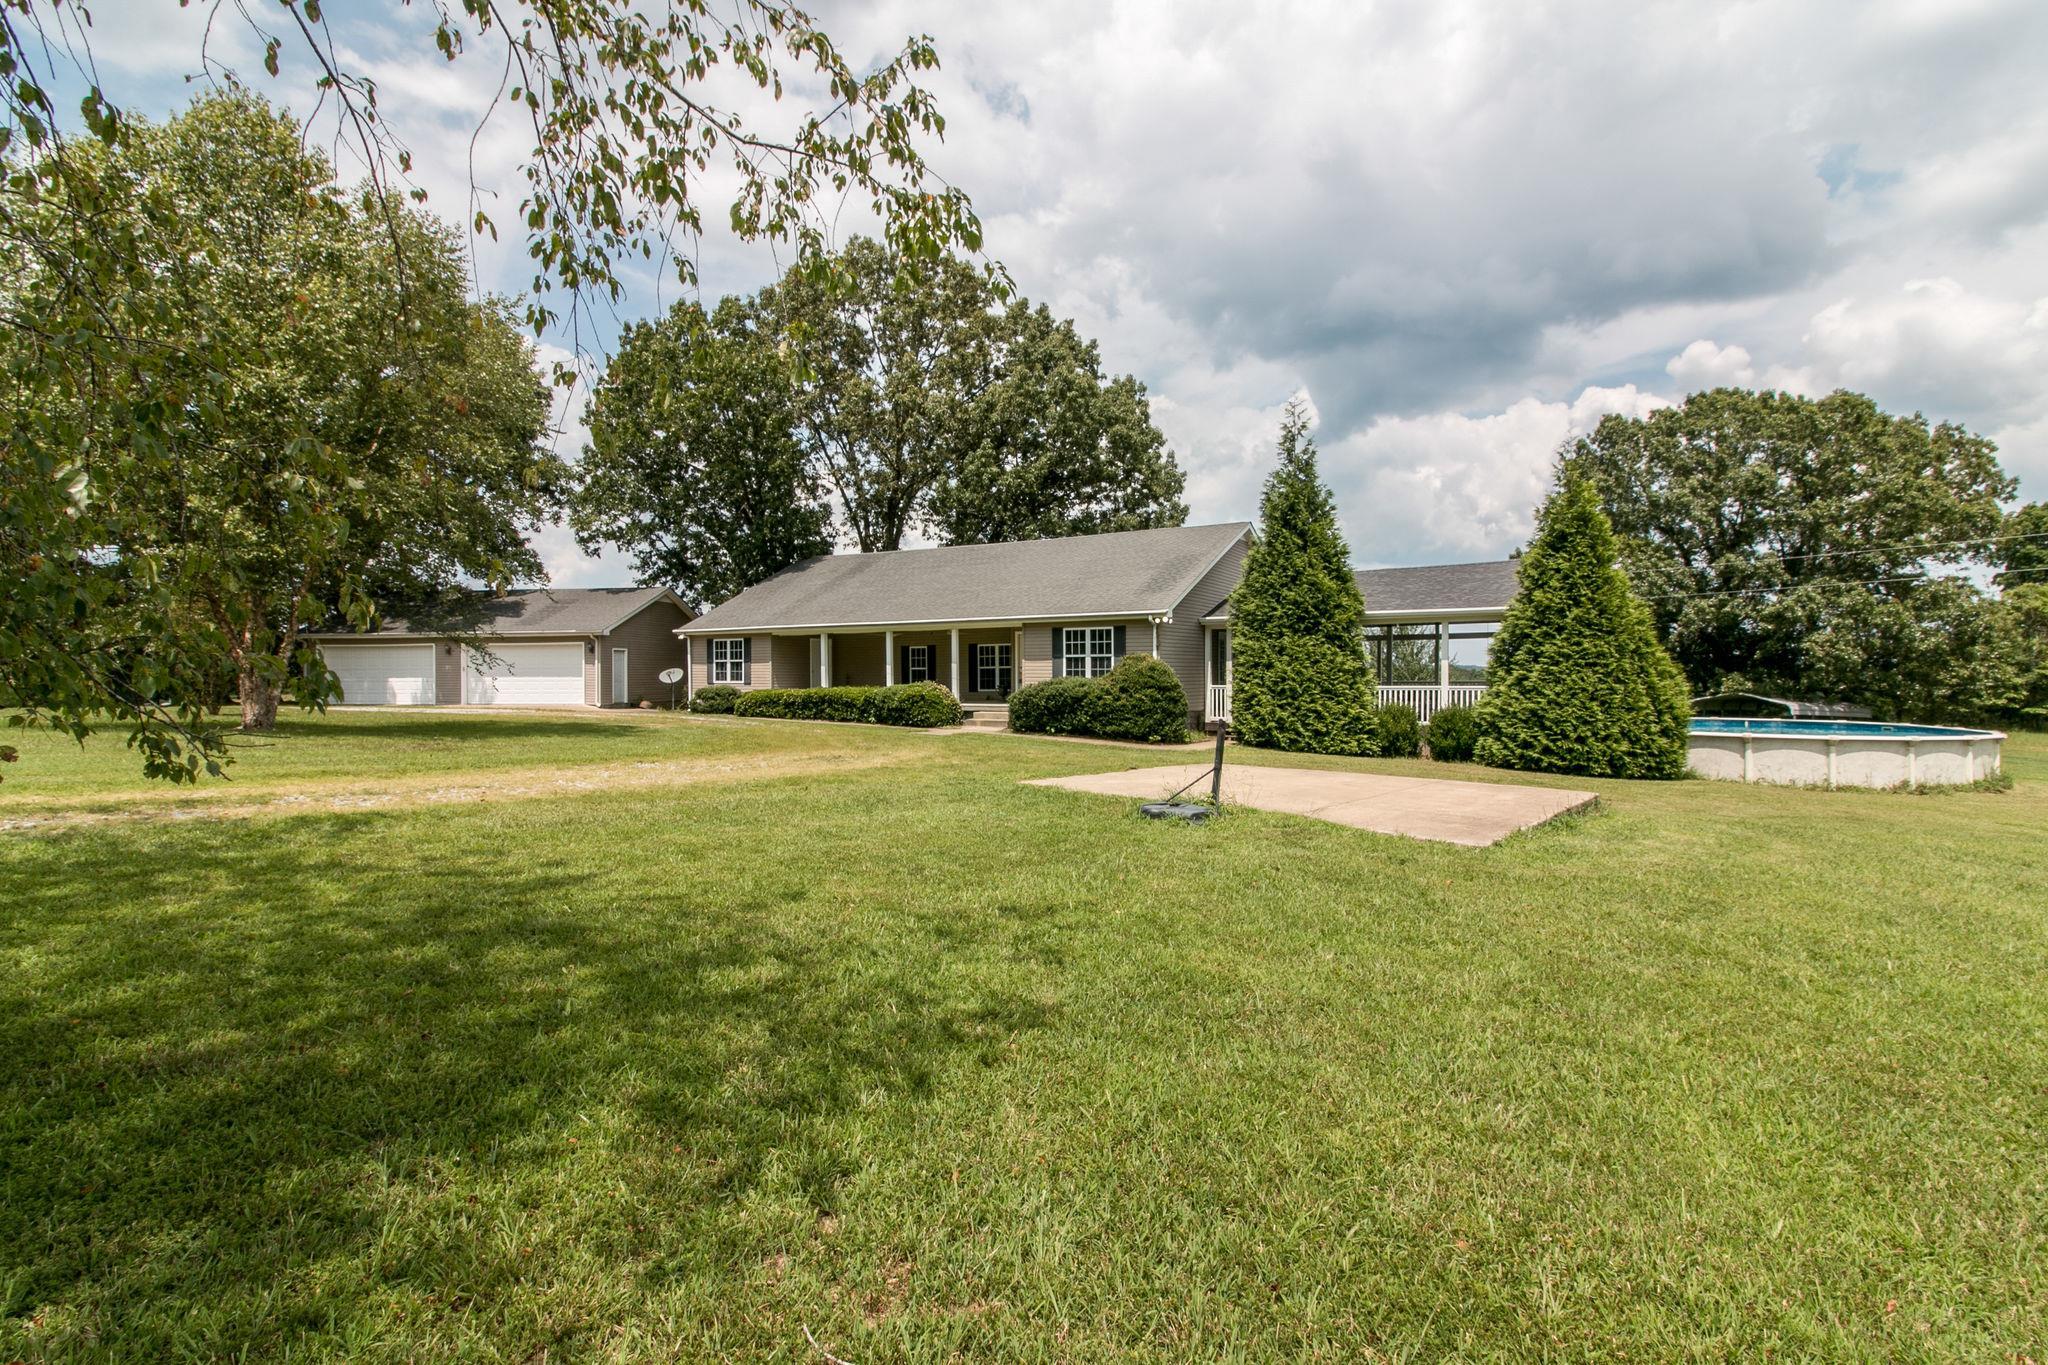 2121 Gamble Hollow Rd, Cumberland Furnace, TN 37051 - Cumberland Furnace, TN real estate listing